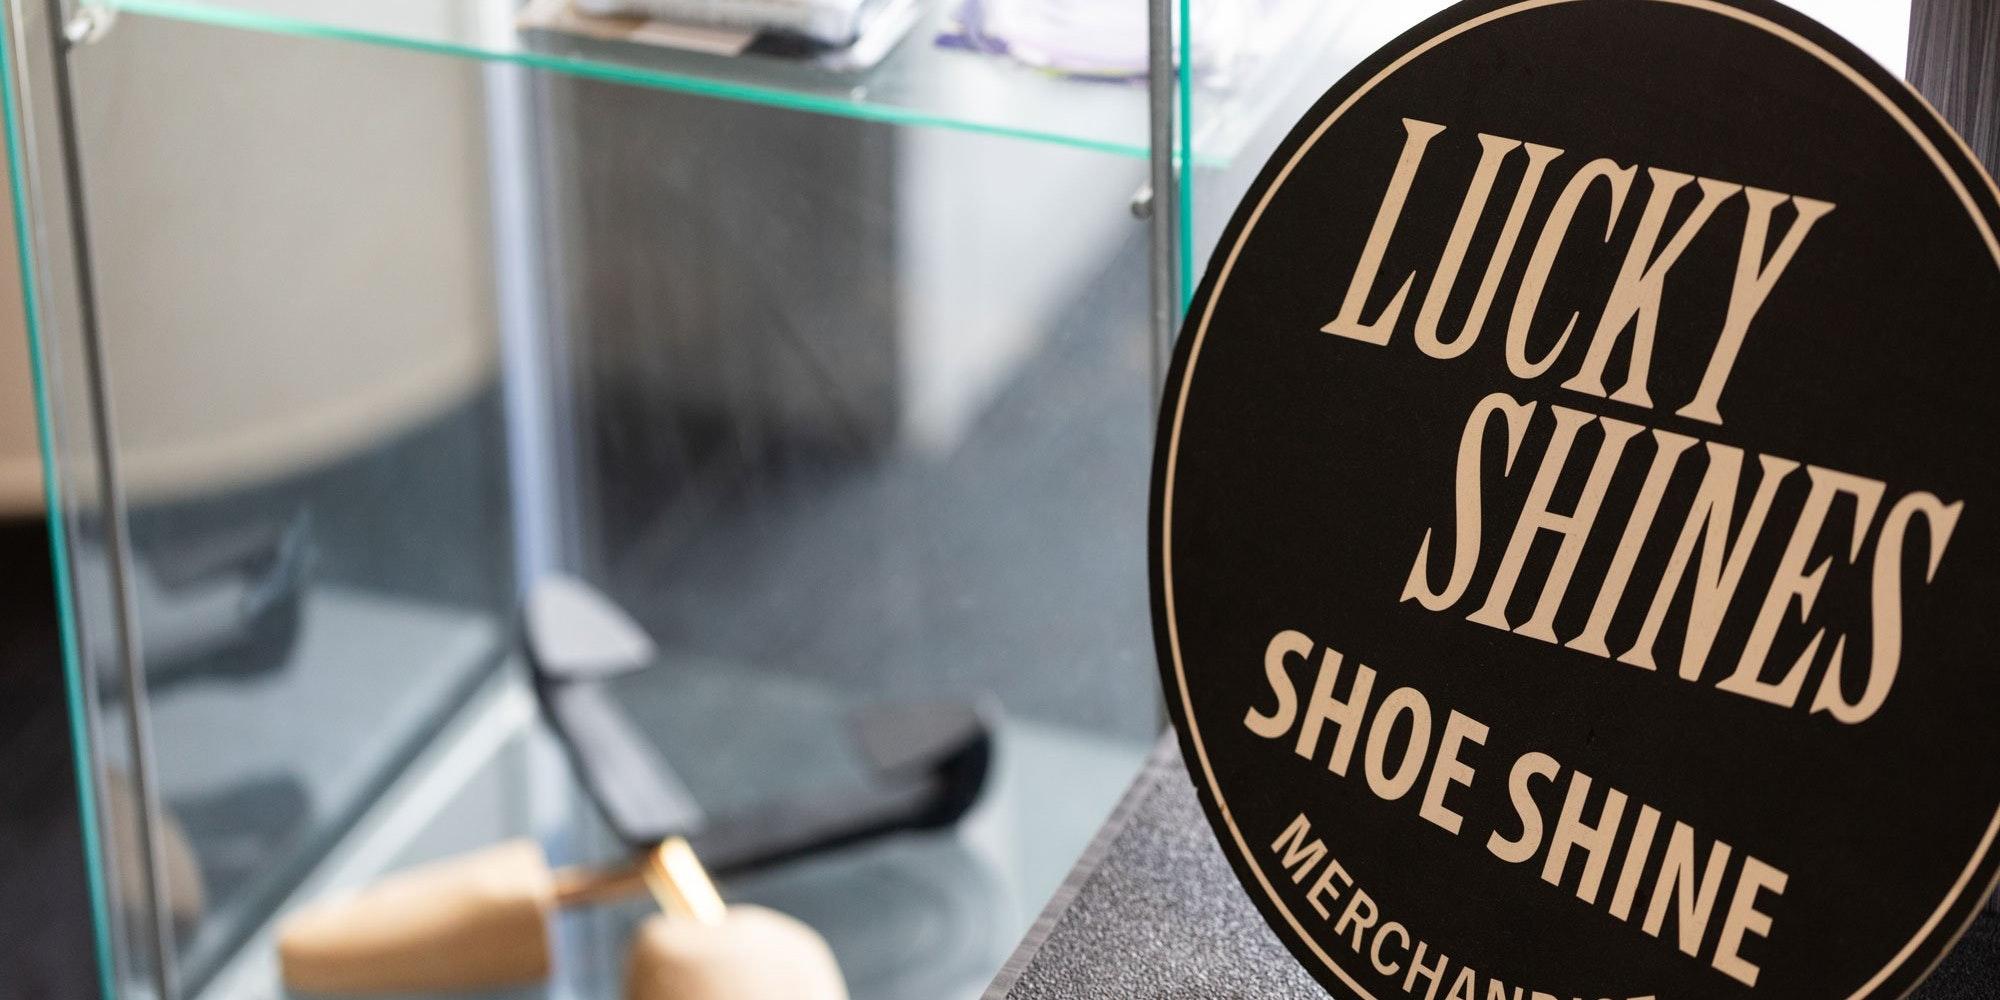 Lucky Shines Shoe Shine